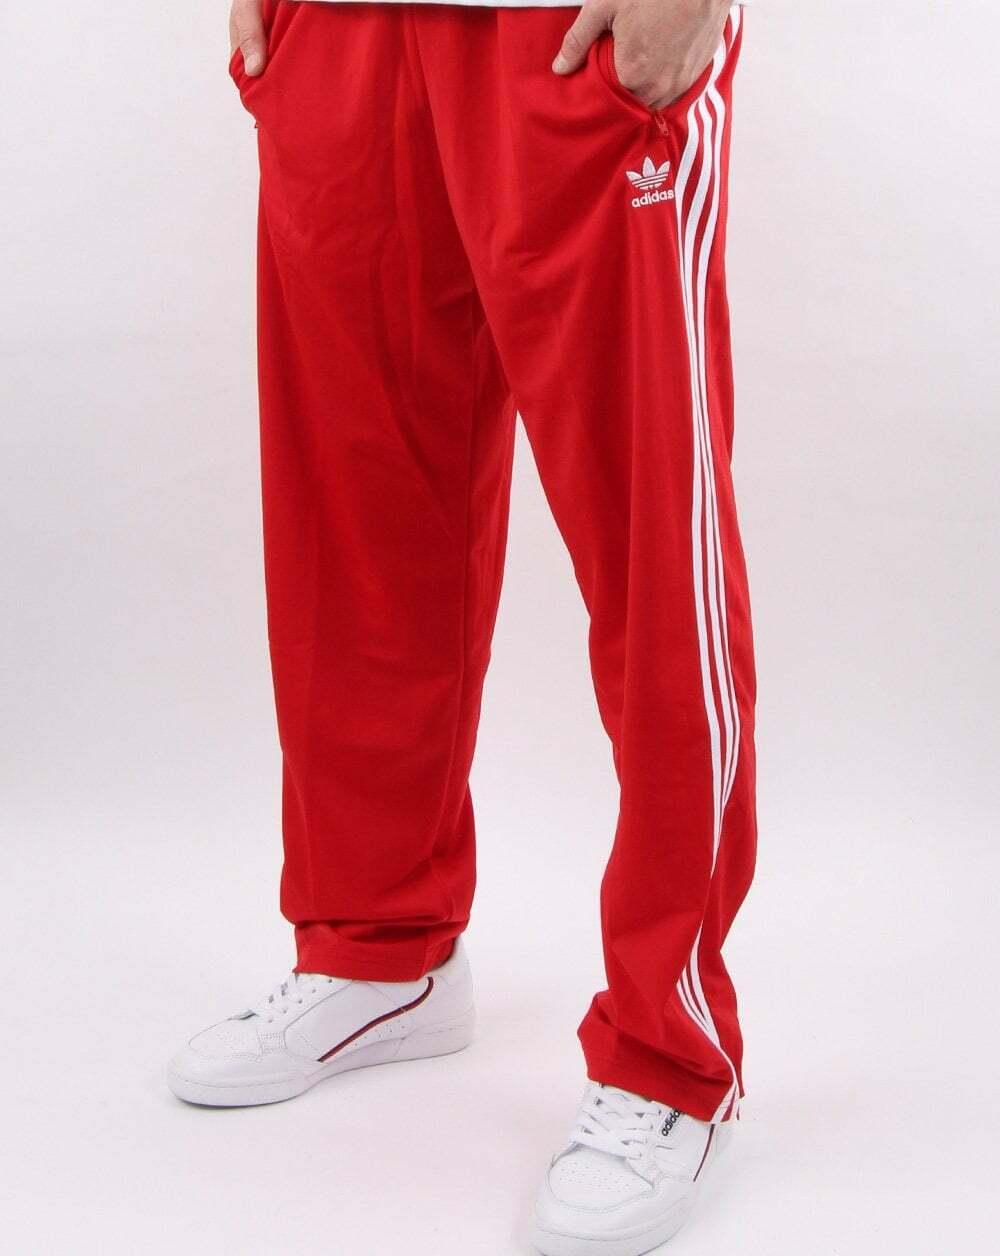 Hose 3 Streifen Originals Adidas Herren DJ2118 blau